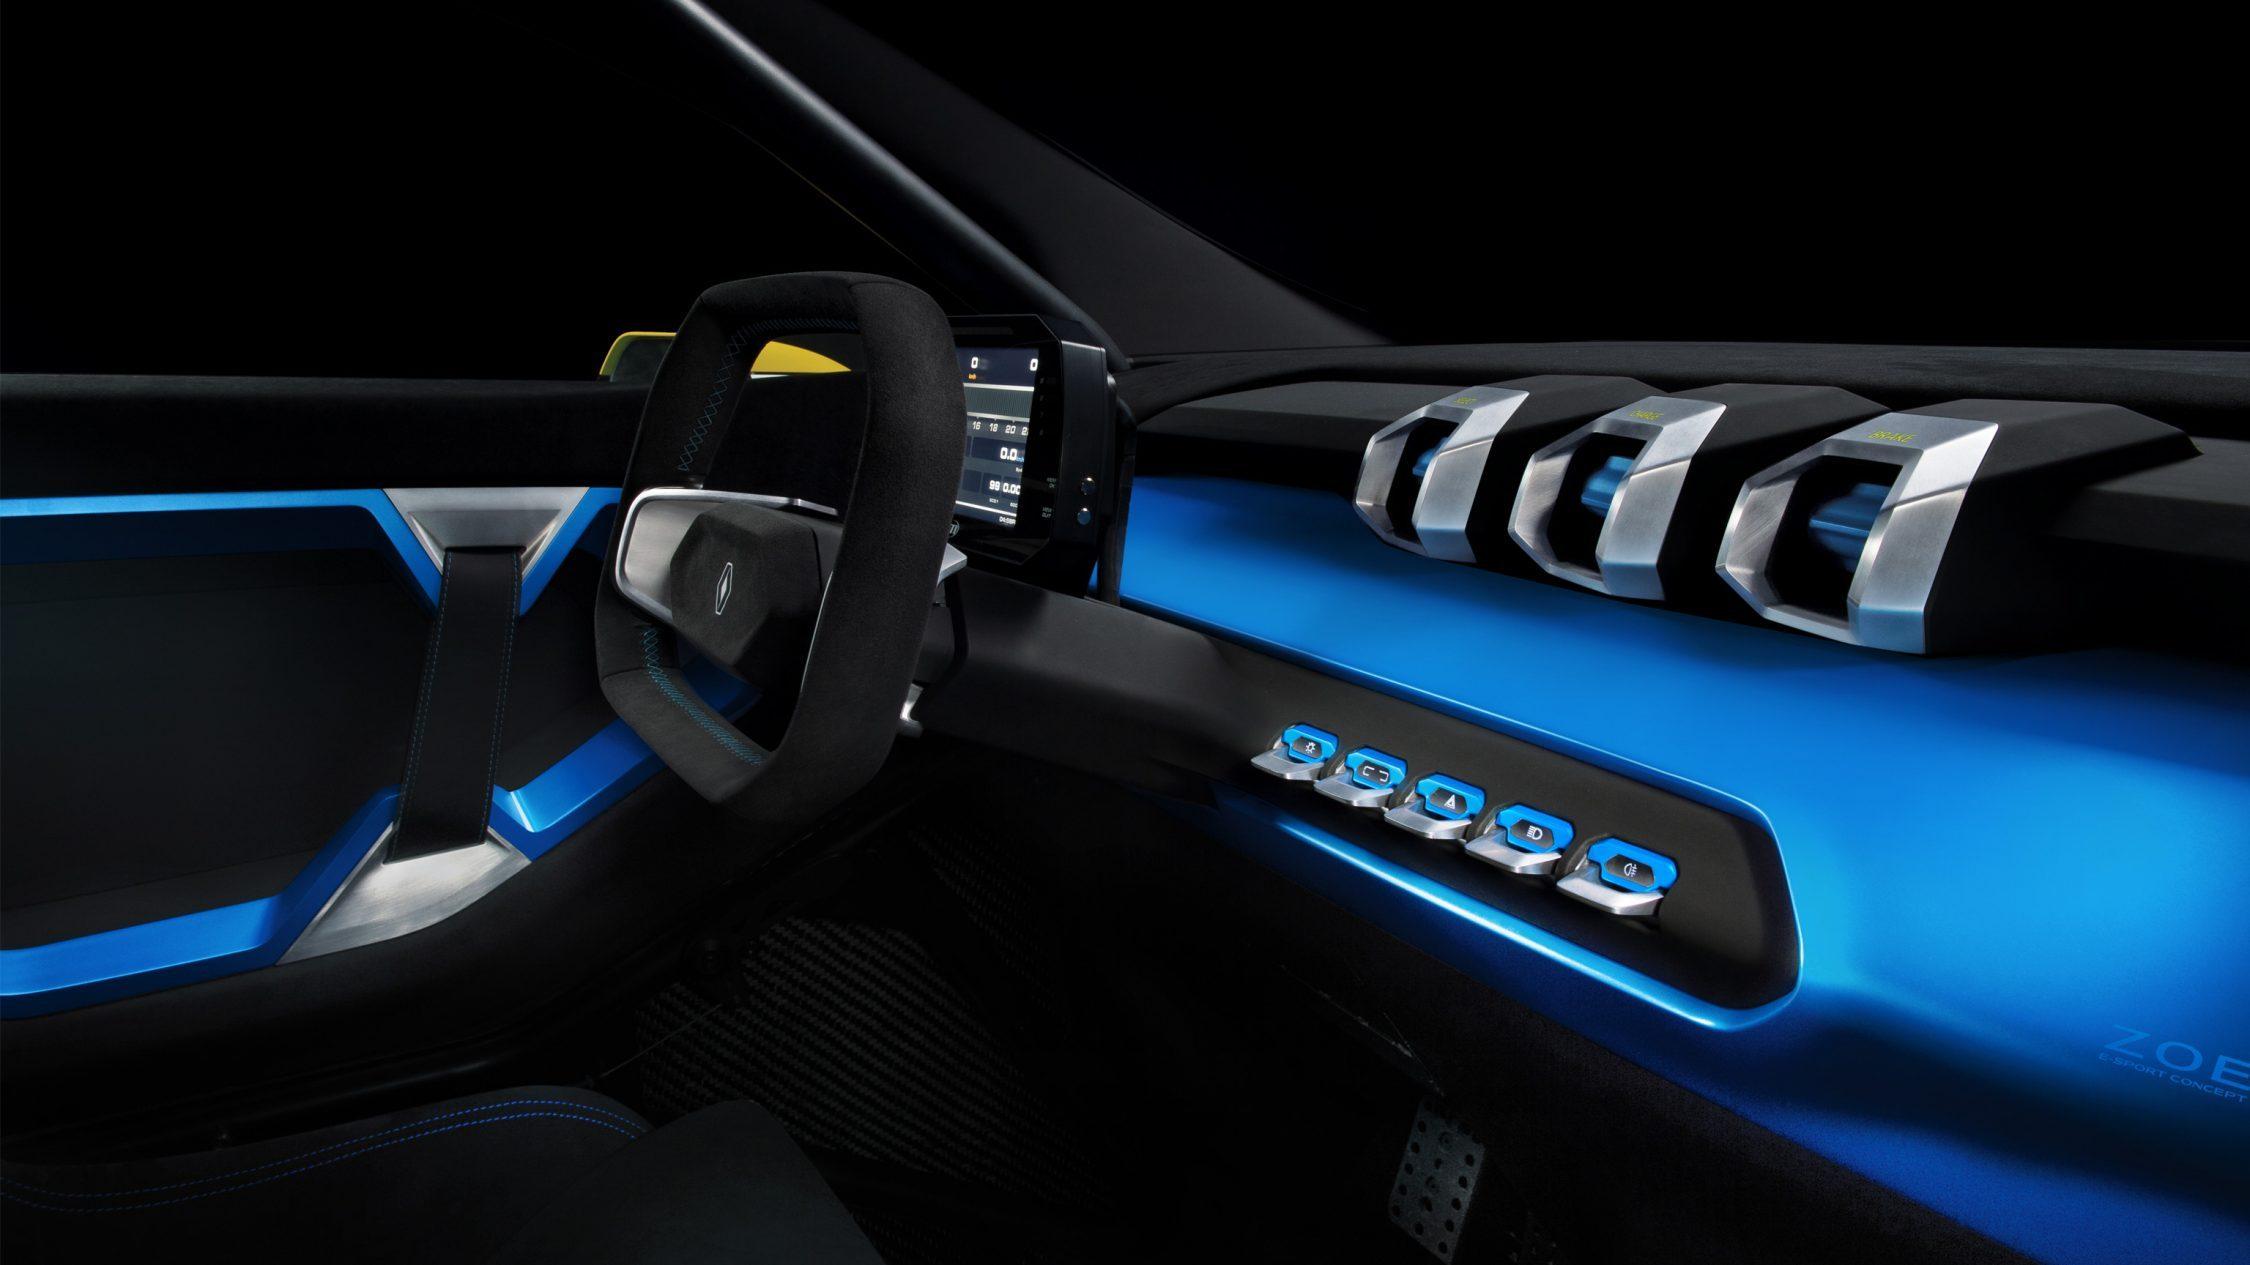 Le tableau de bord sport et futuriste de la Renault ZOE e-Sport Concept